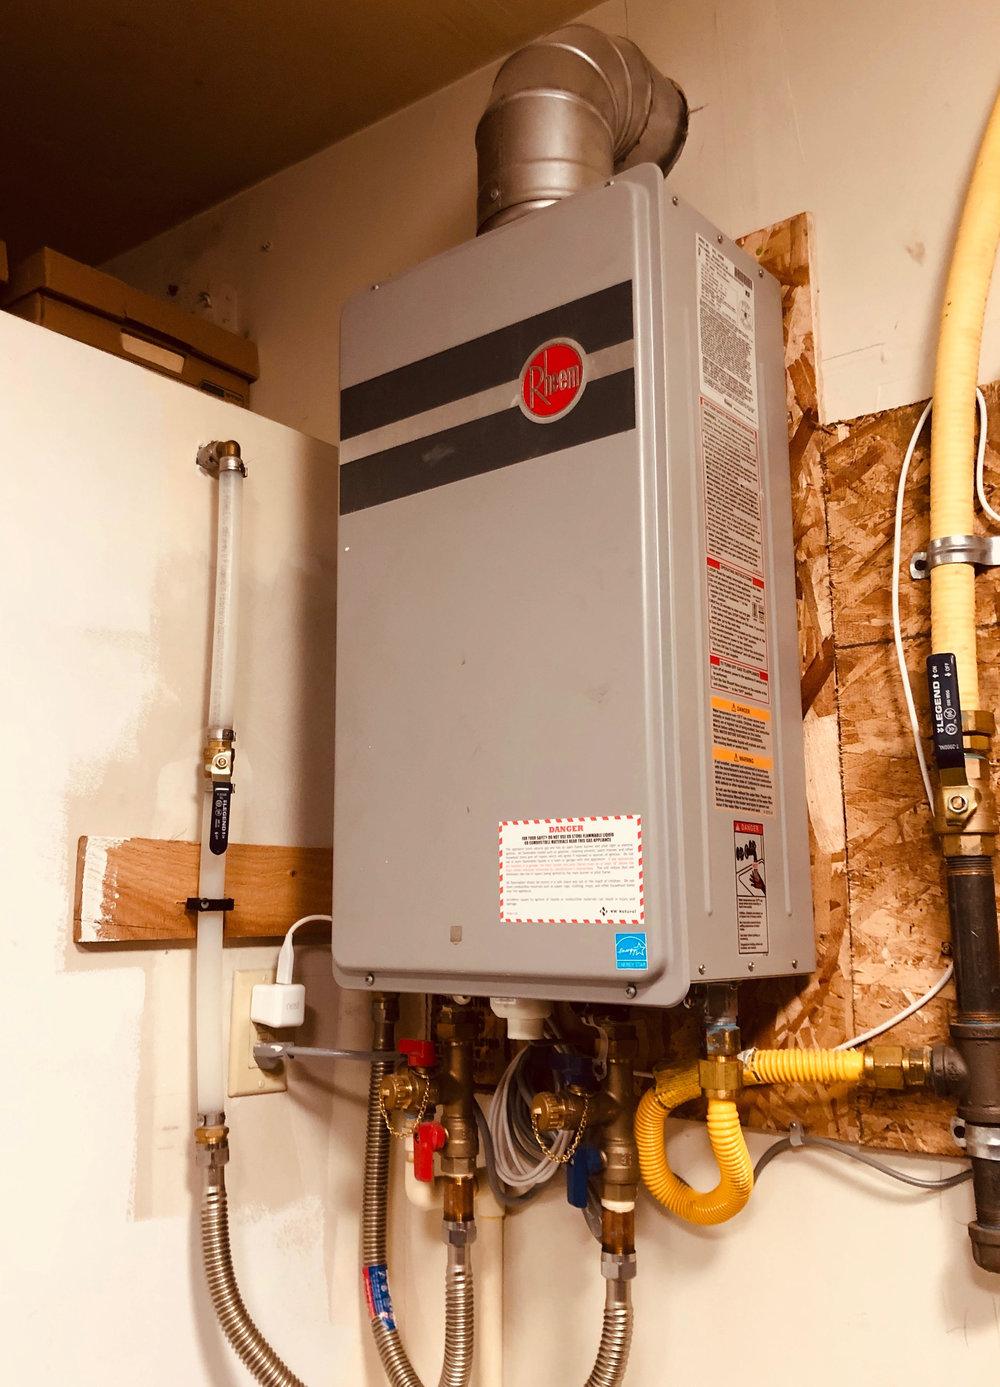 Residential tankless water heater install Rheem